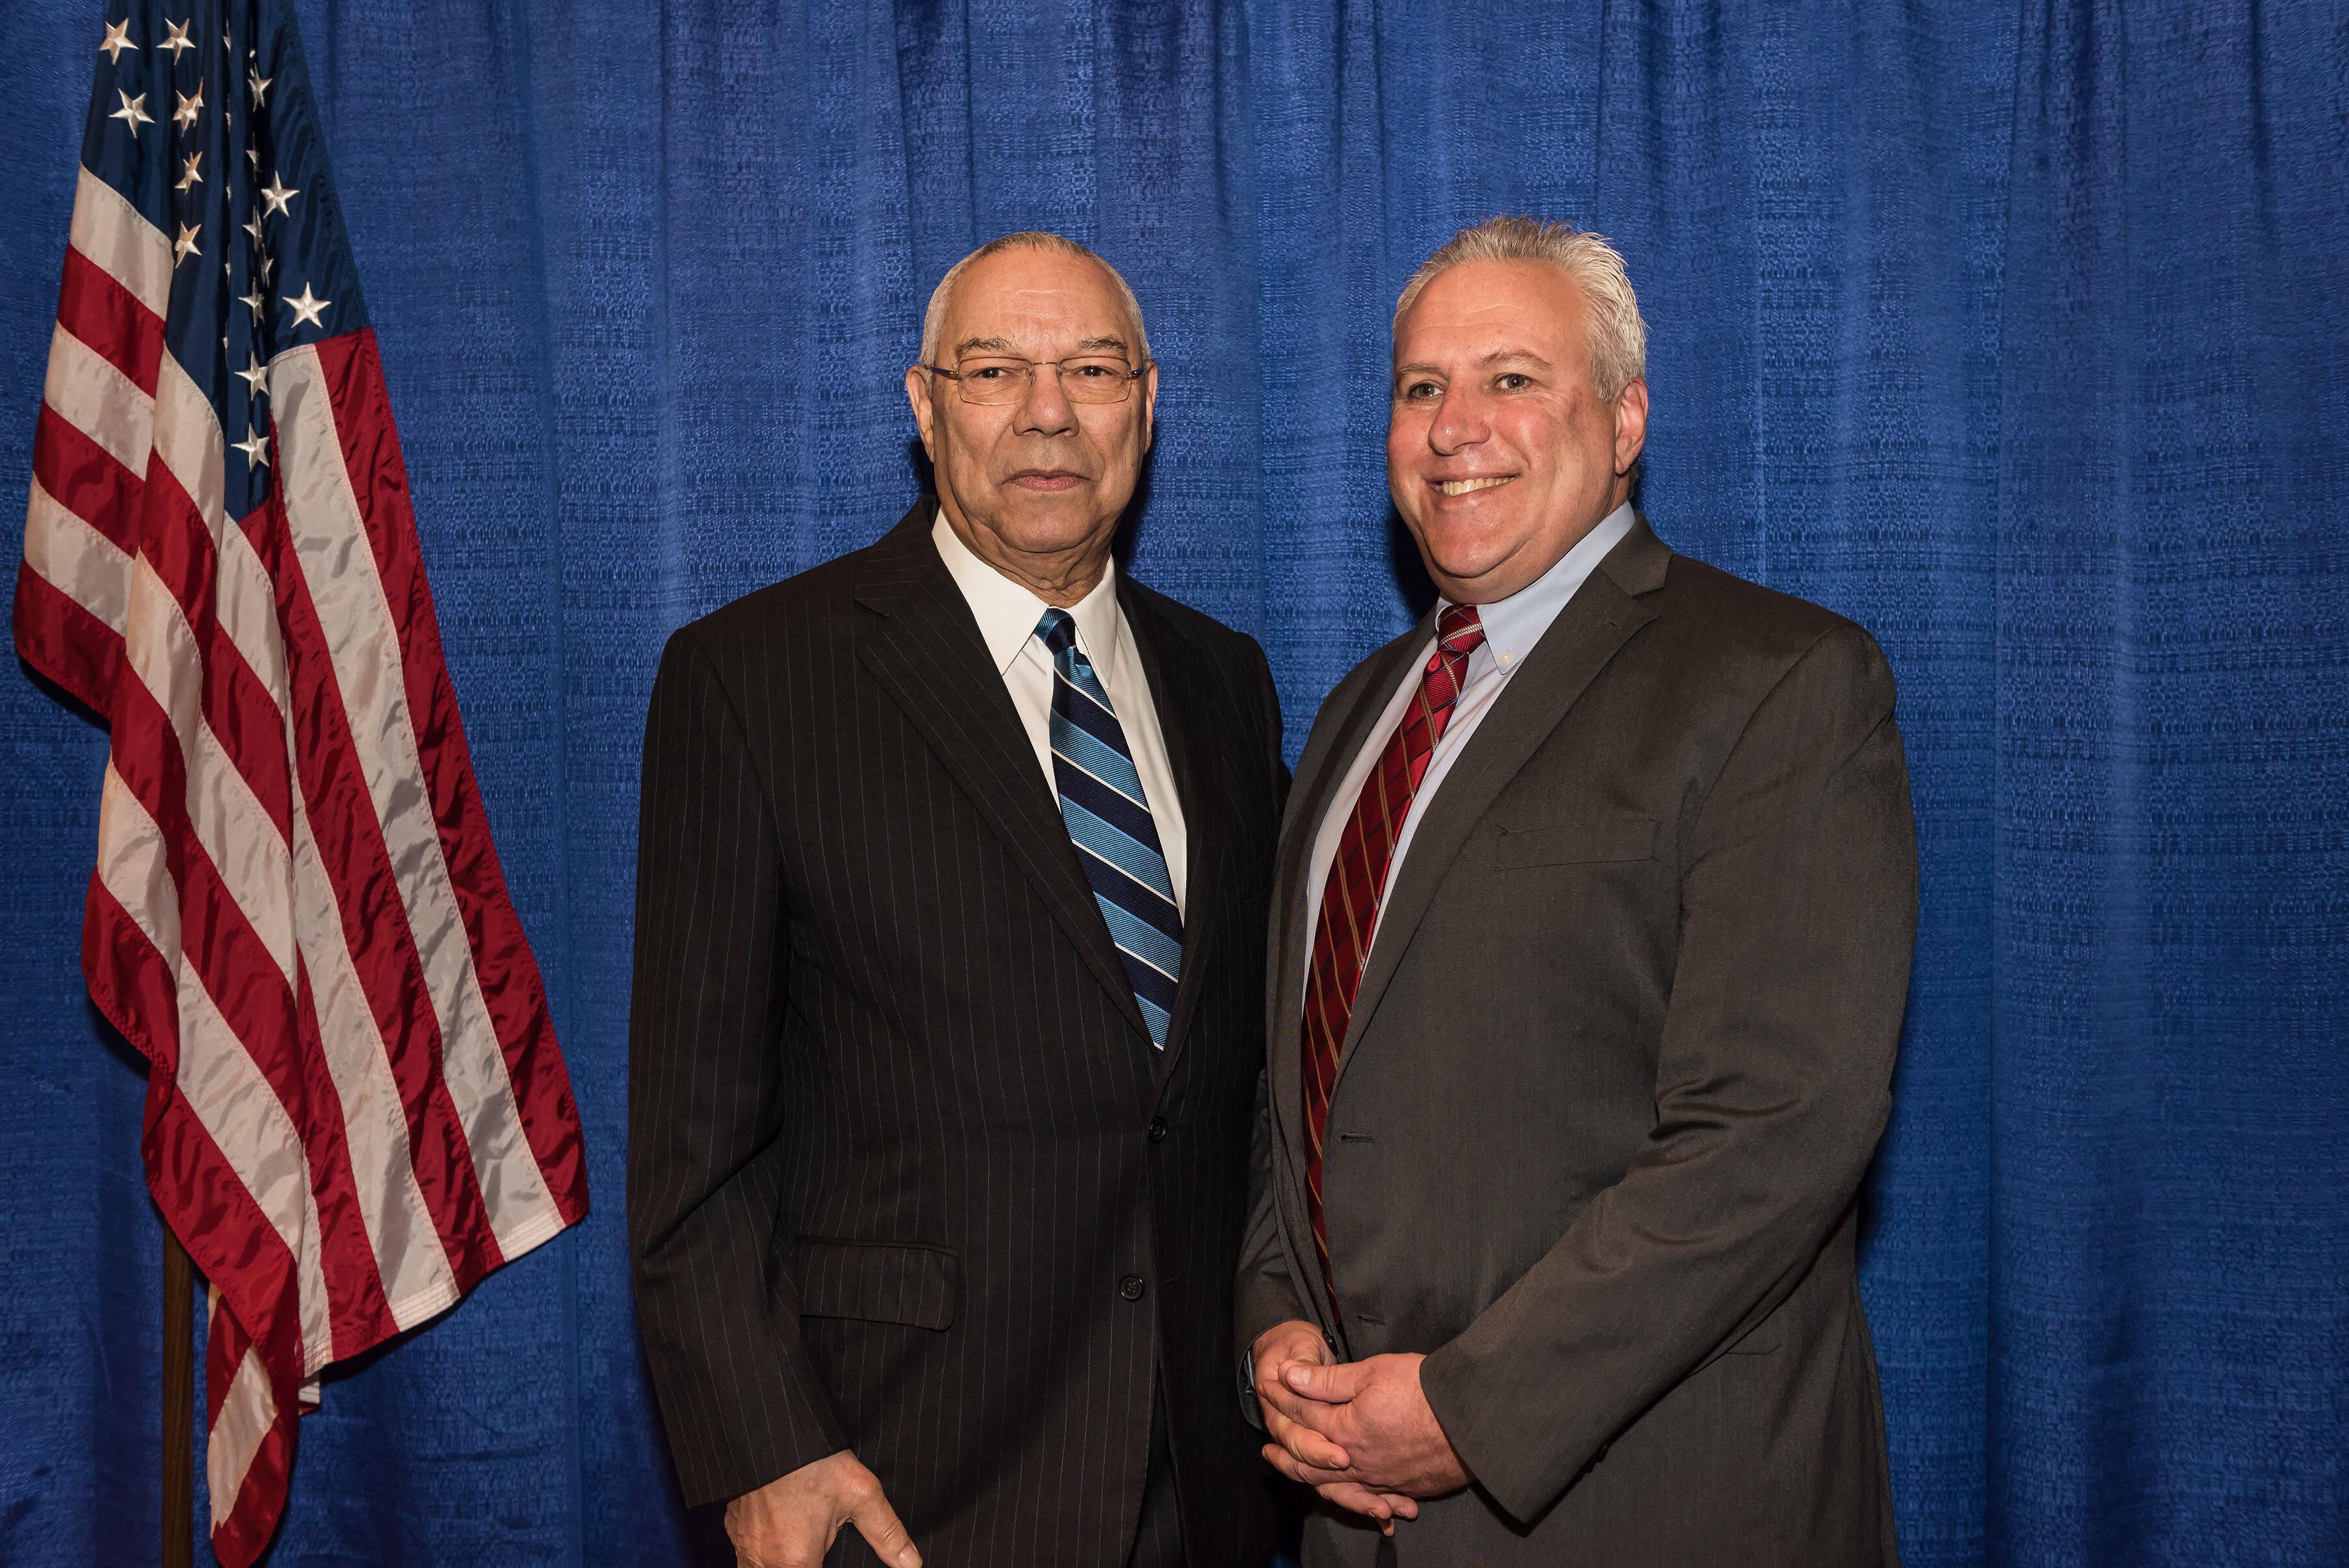 Colin Powell Sheris.jpg